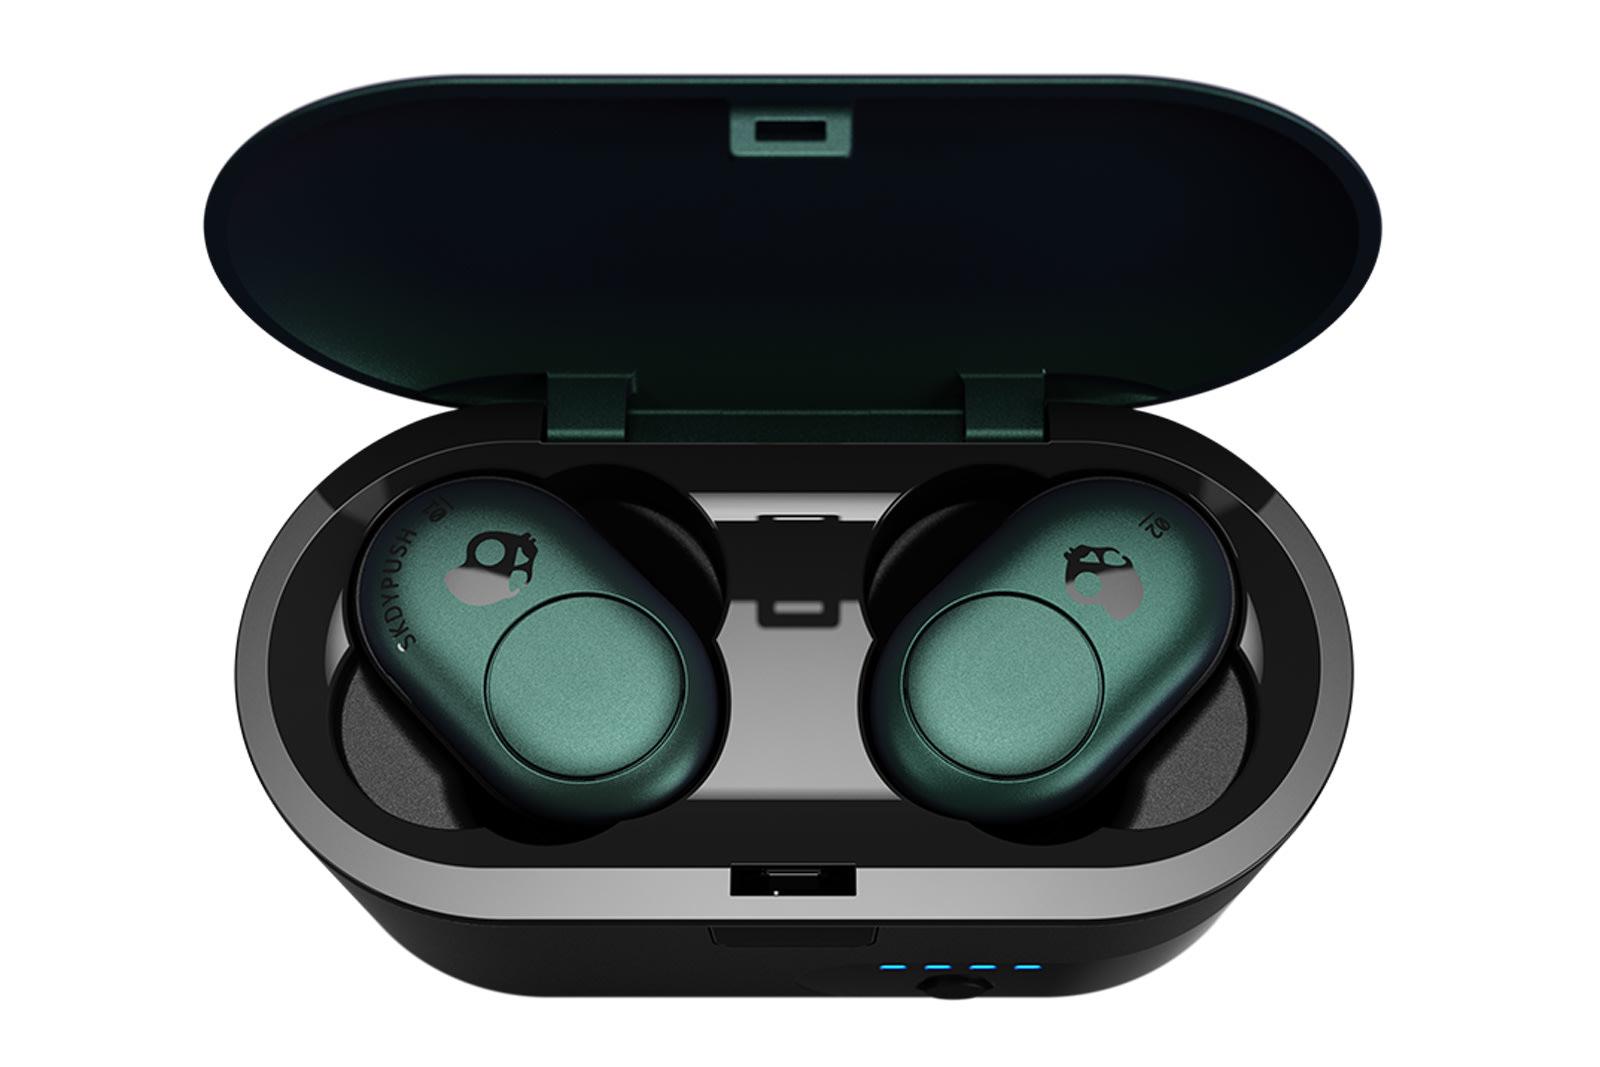 Skullcandy Push wireless earbuds in their case